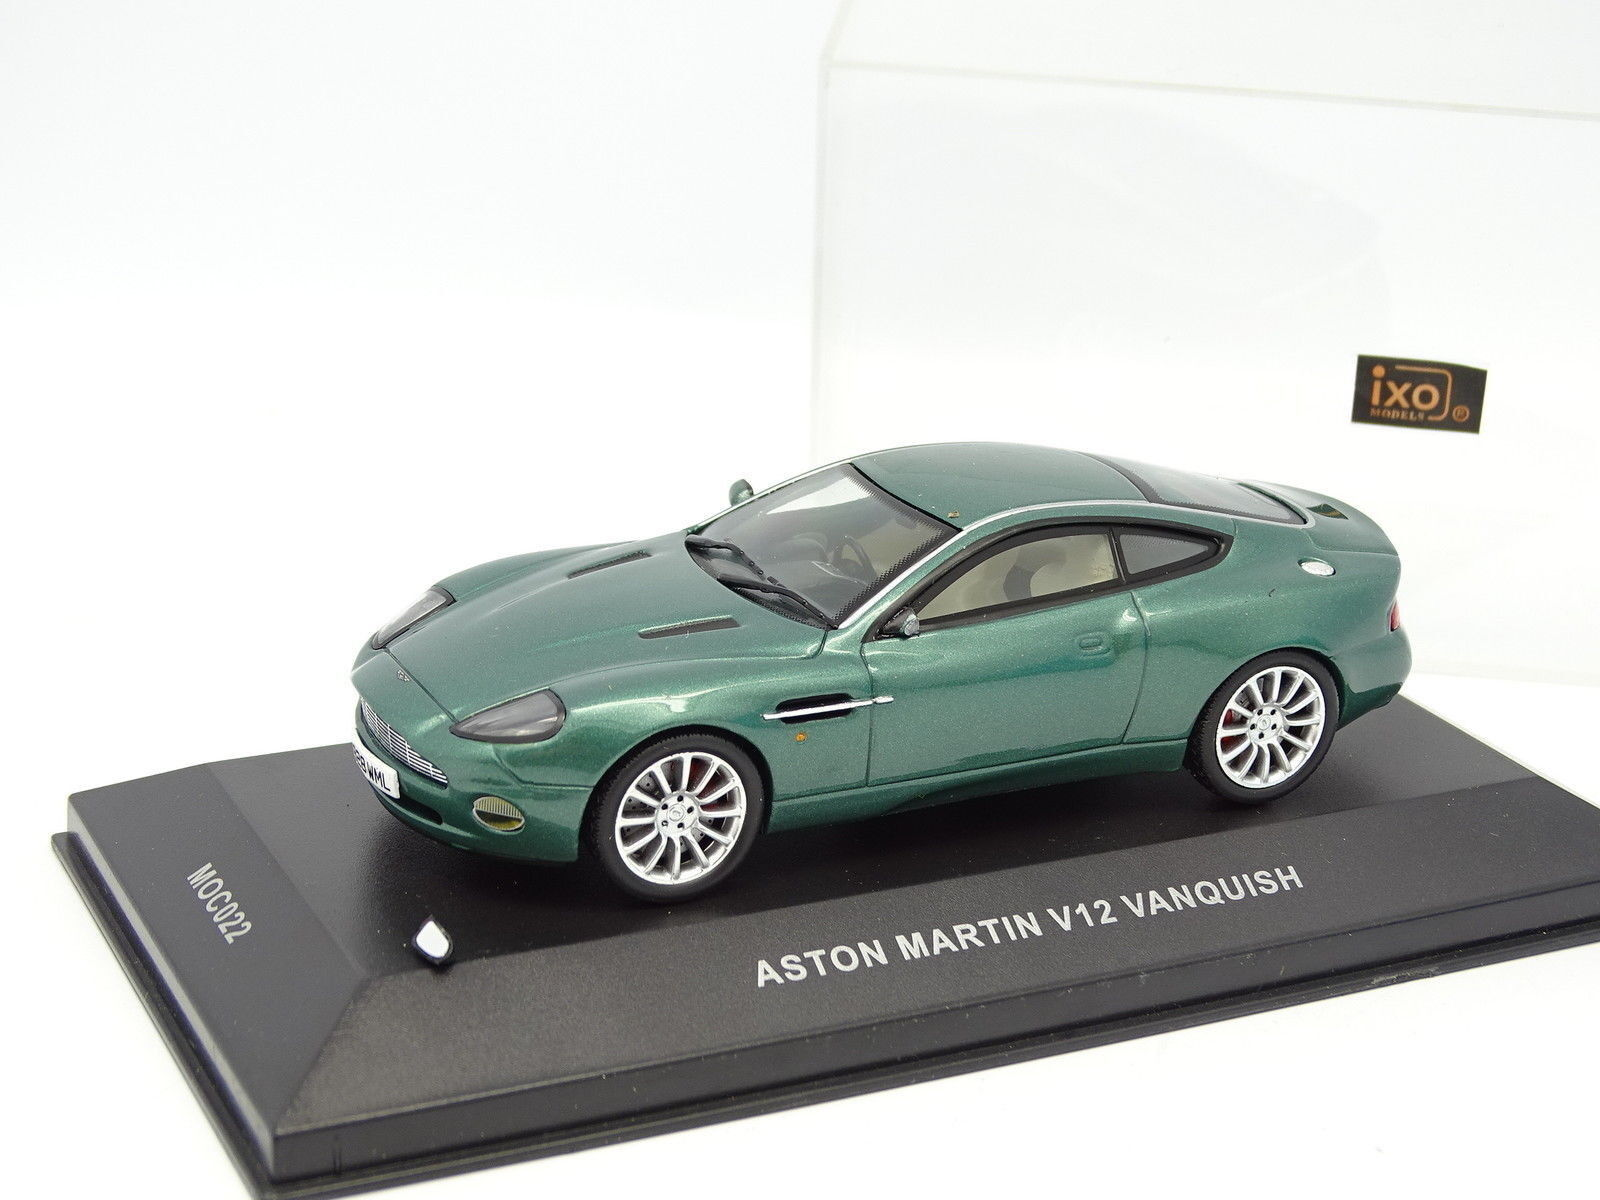 Ixo 1 43 - Aston Martin V12 Green Vanquish